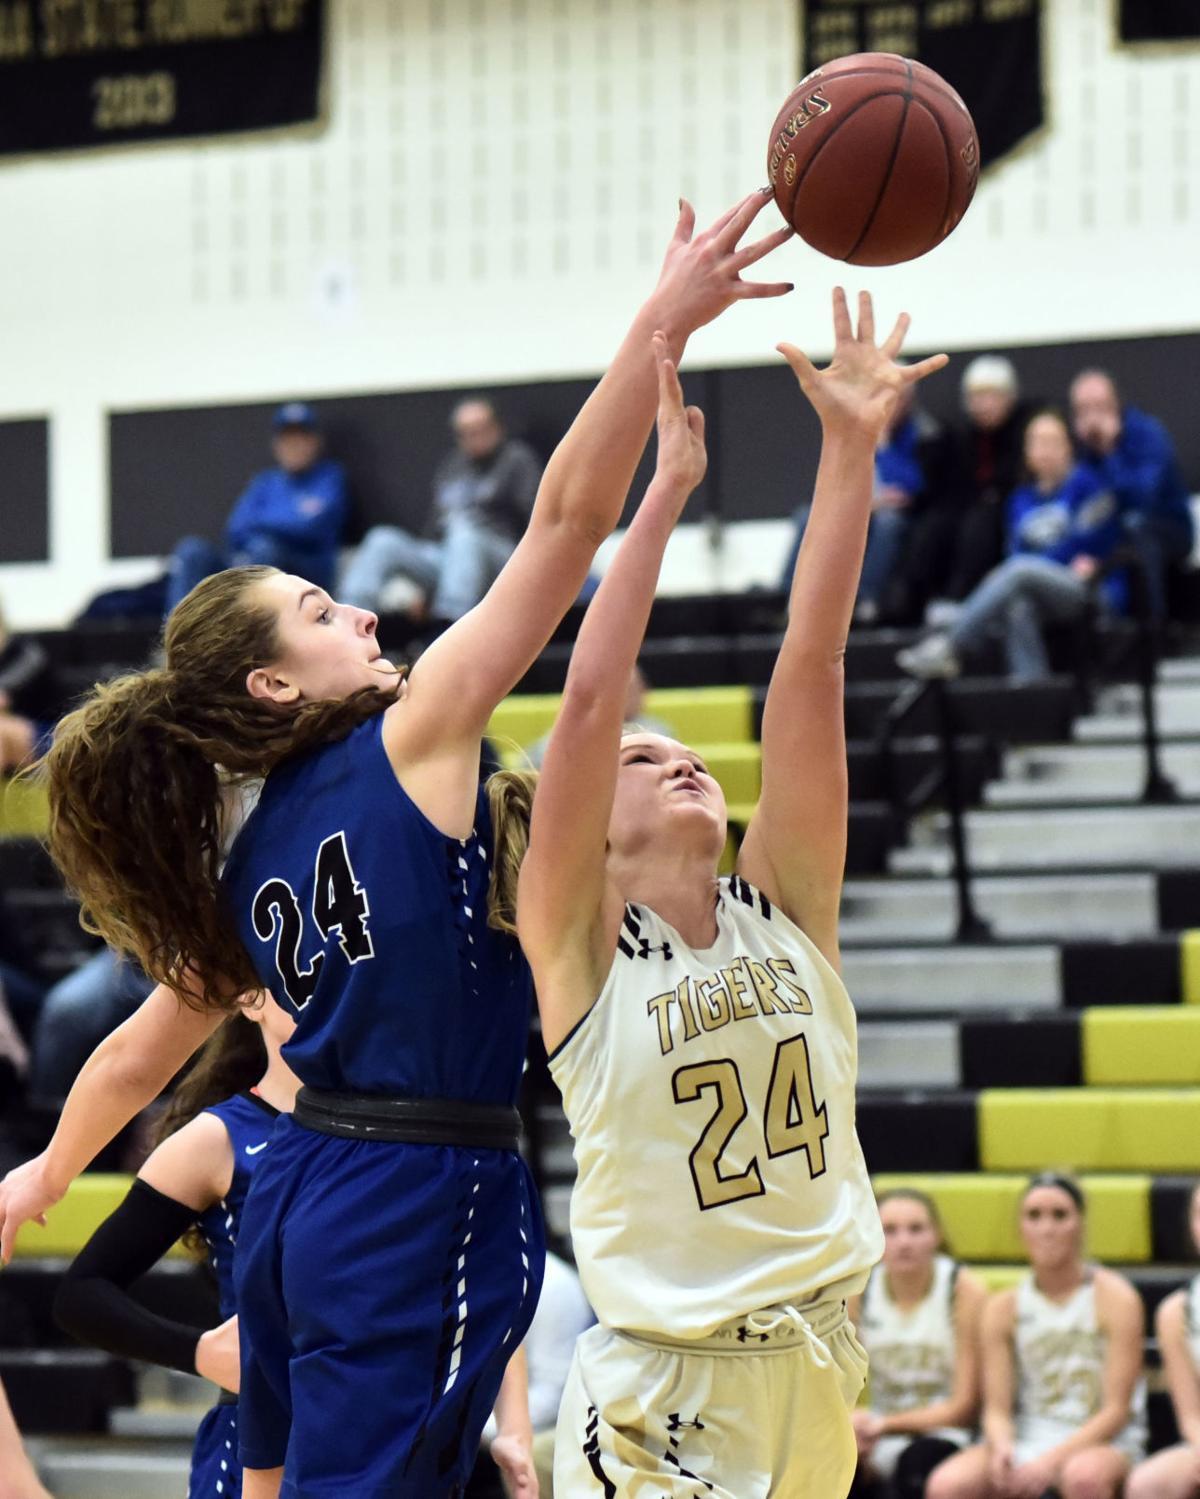 H.S. Girls Basketball: Southern Columbia beats South Williamsport